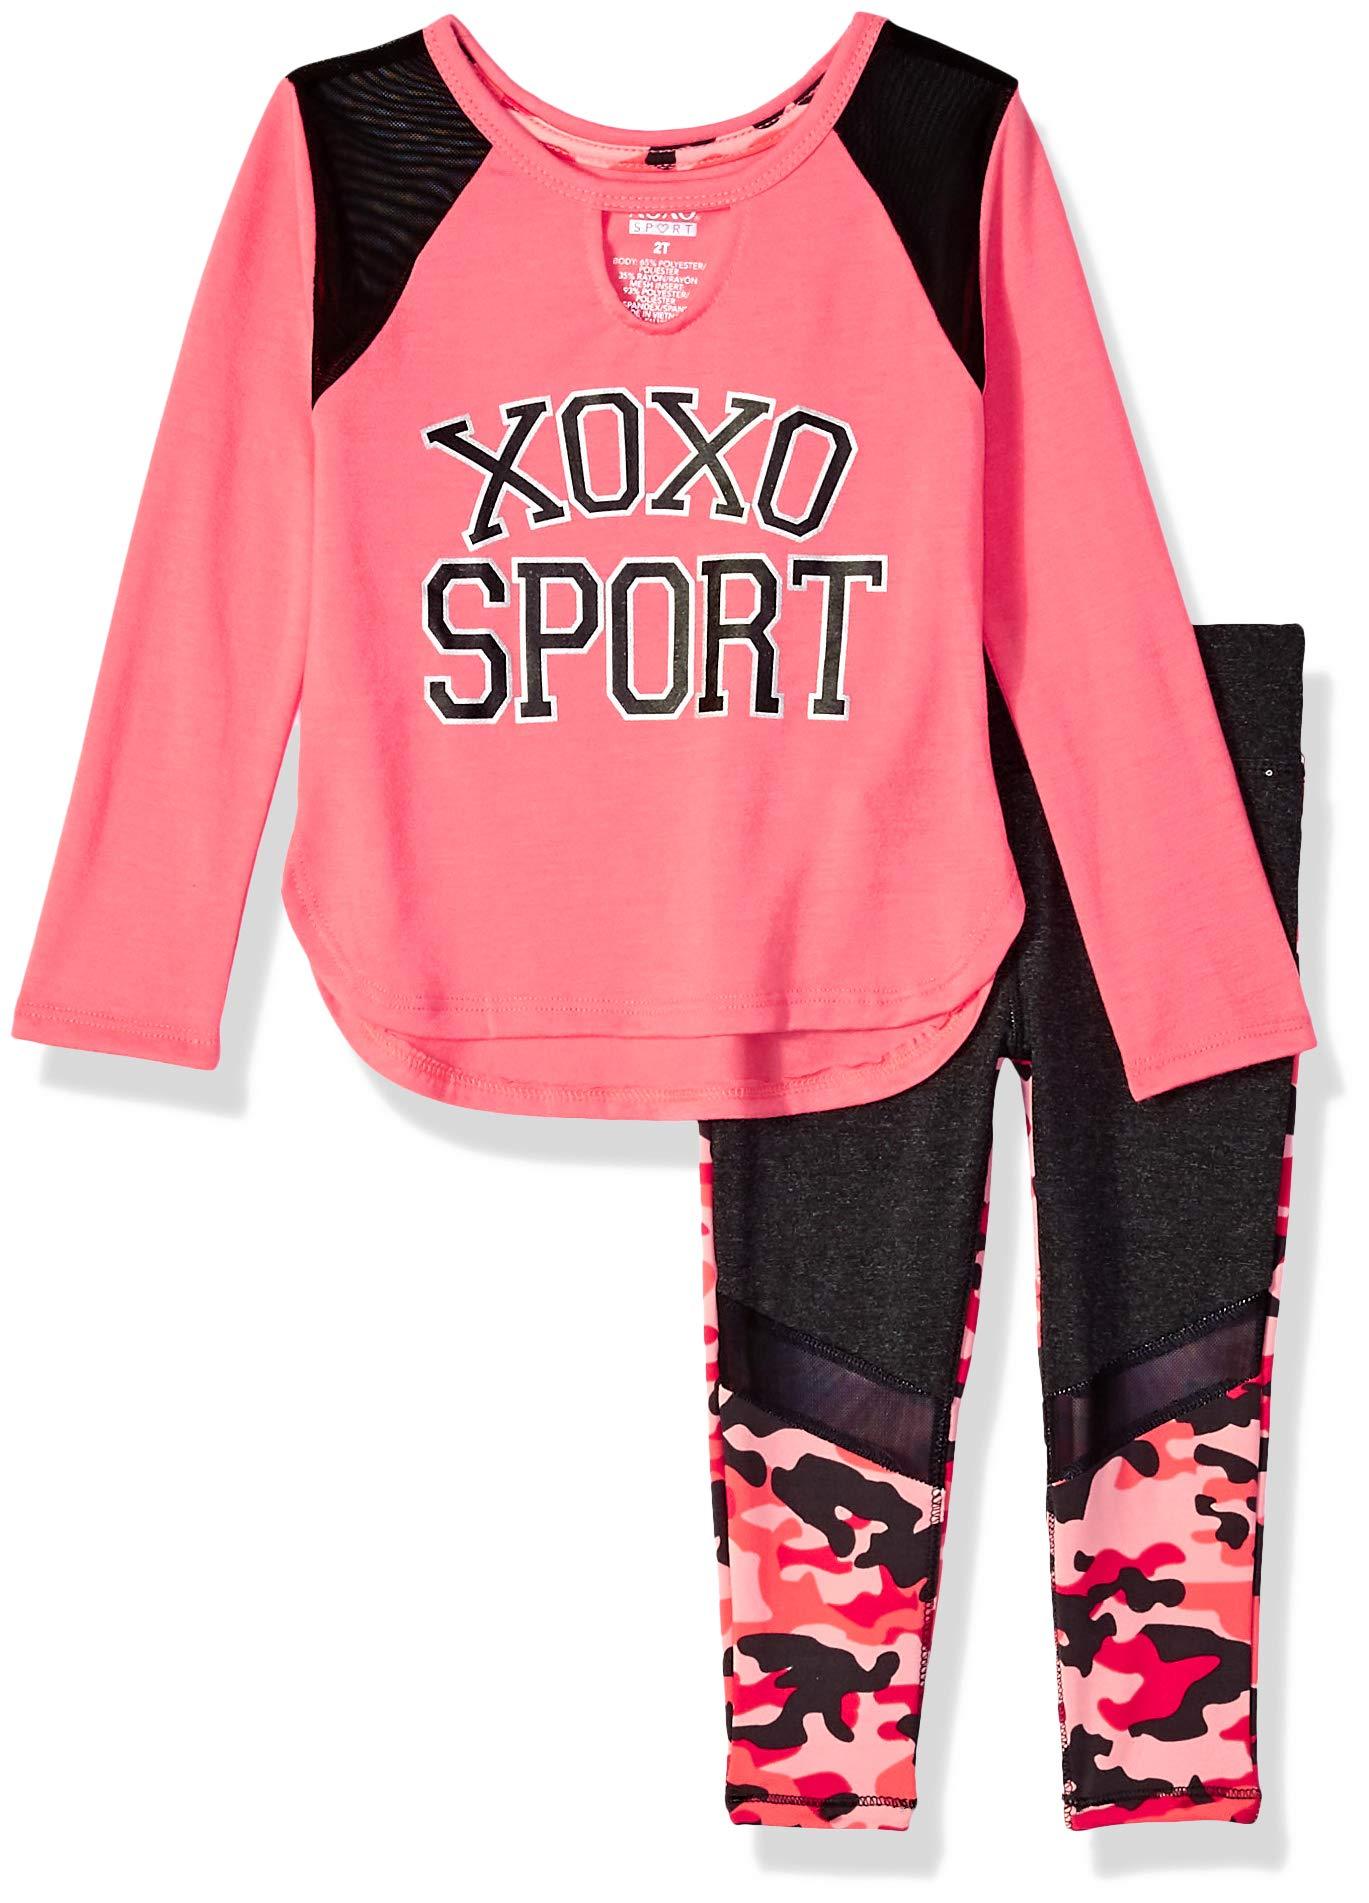 XOXO Girls' 2 Piece Performance Top and Legging Set